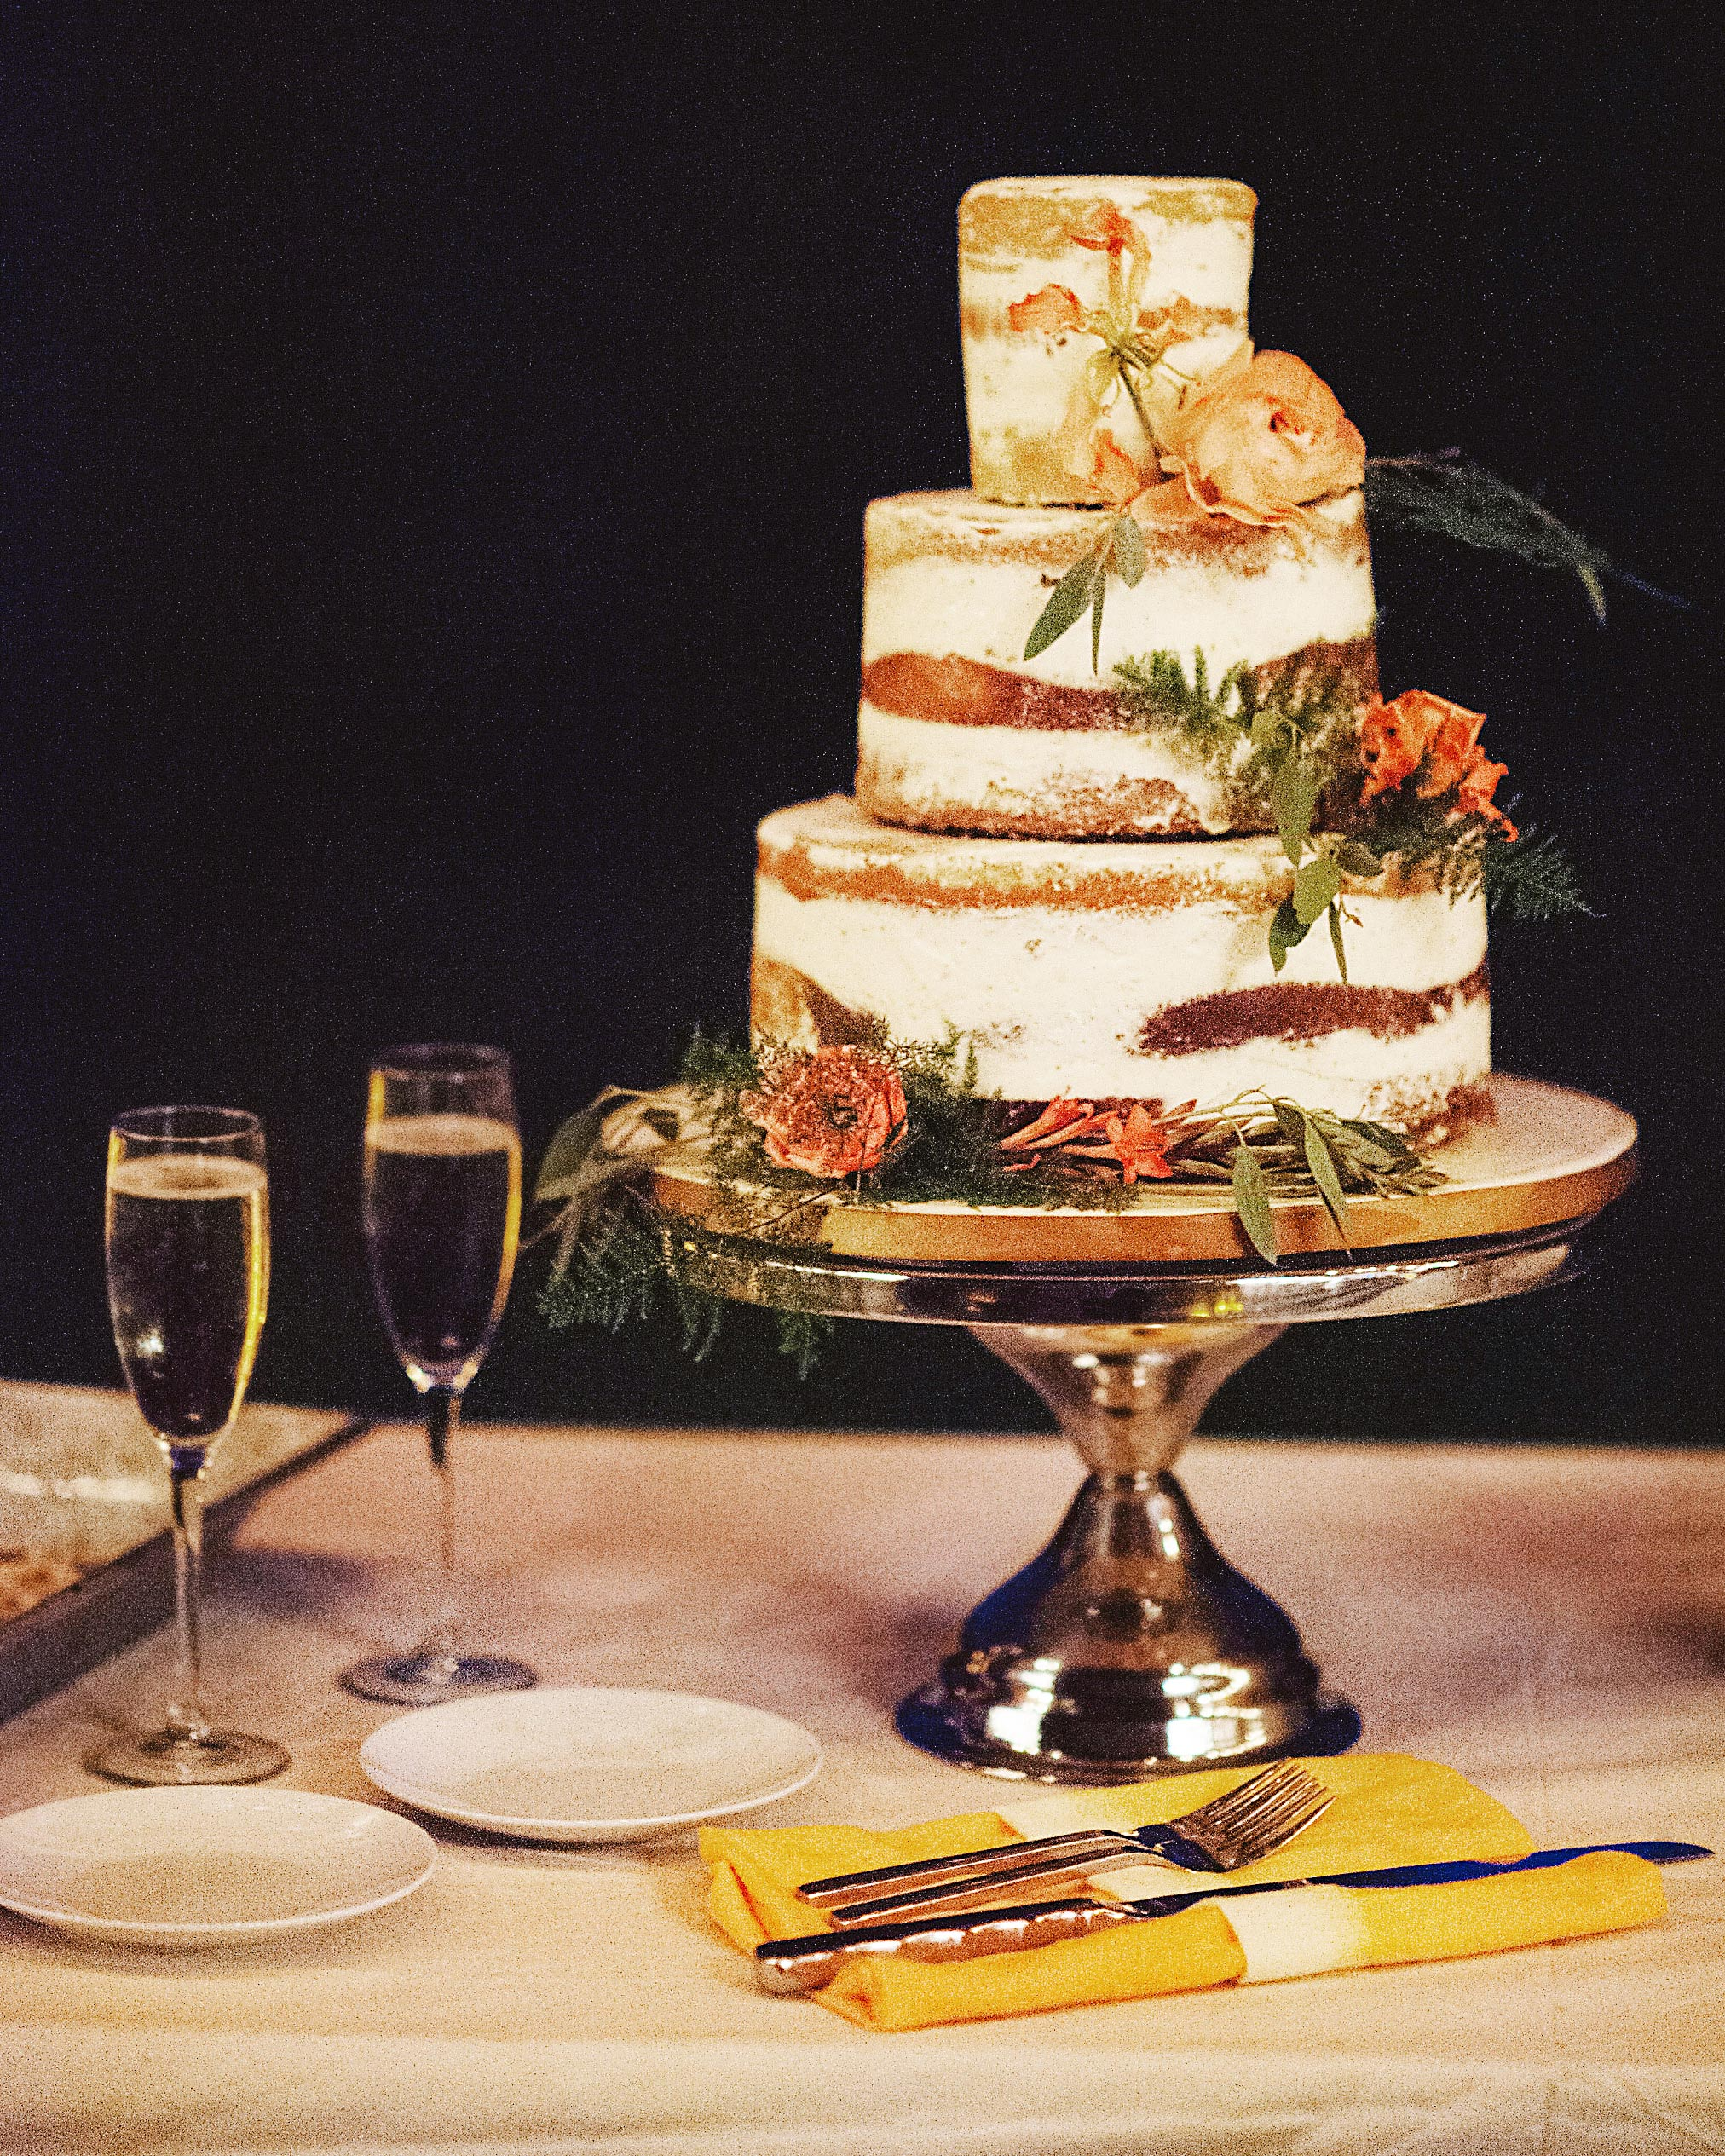 cat-vince-wedding-cake-047-s112646-0216.jpg